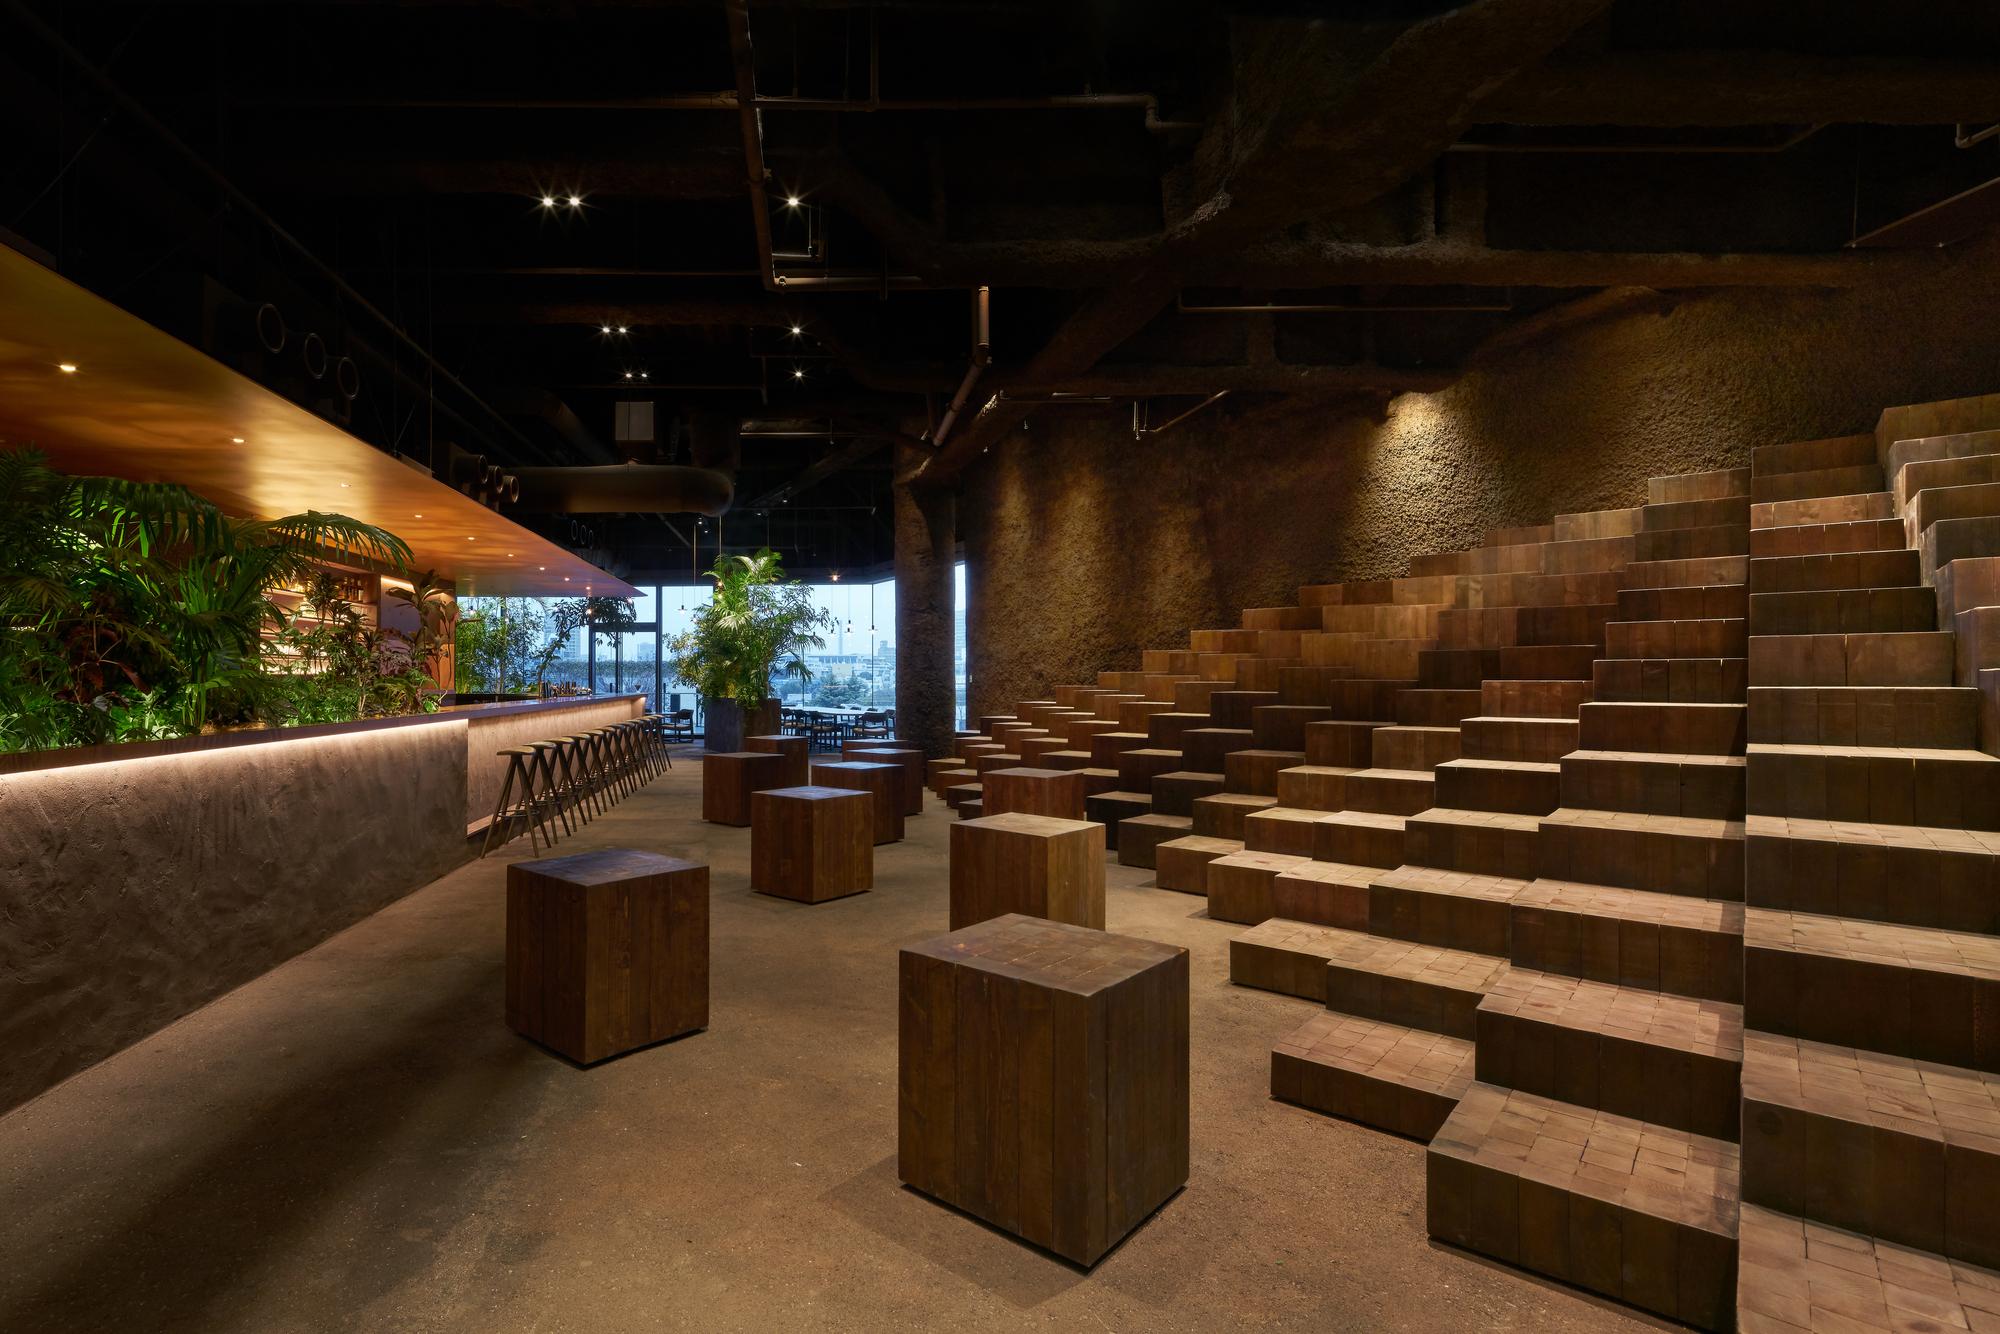 GYRE.FOOD Restaurants & Shops / Atelier Tsuyoshi Tane Architects